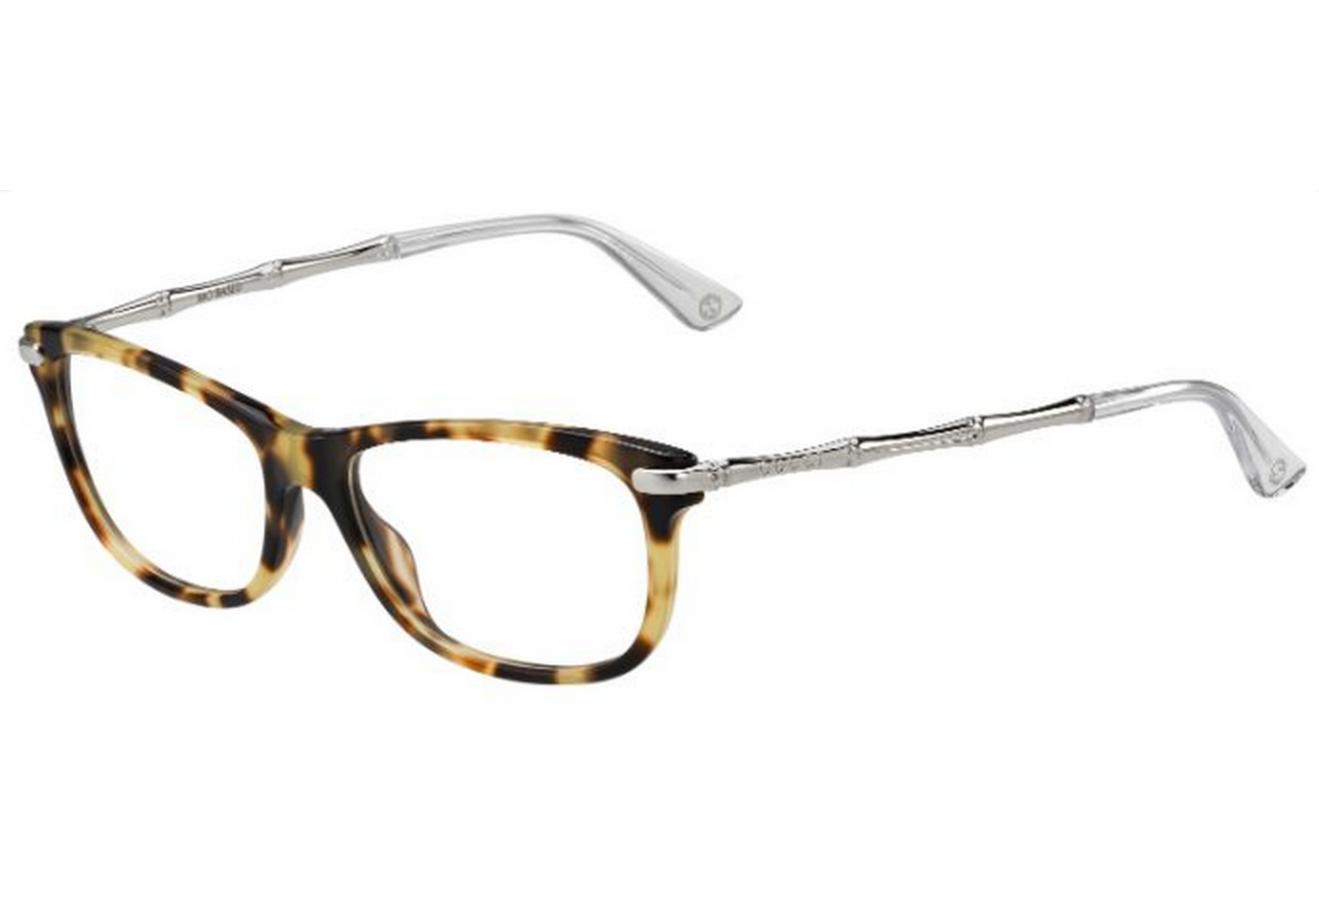 lunettes de vue gucci gg 3779 hrt 53 16. Black Bedroom Furniture Sets. Home Design Ideas